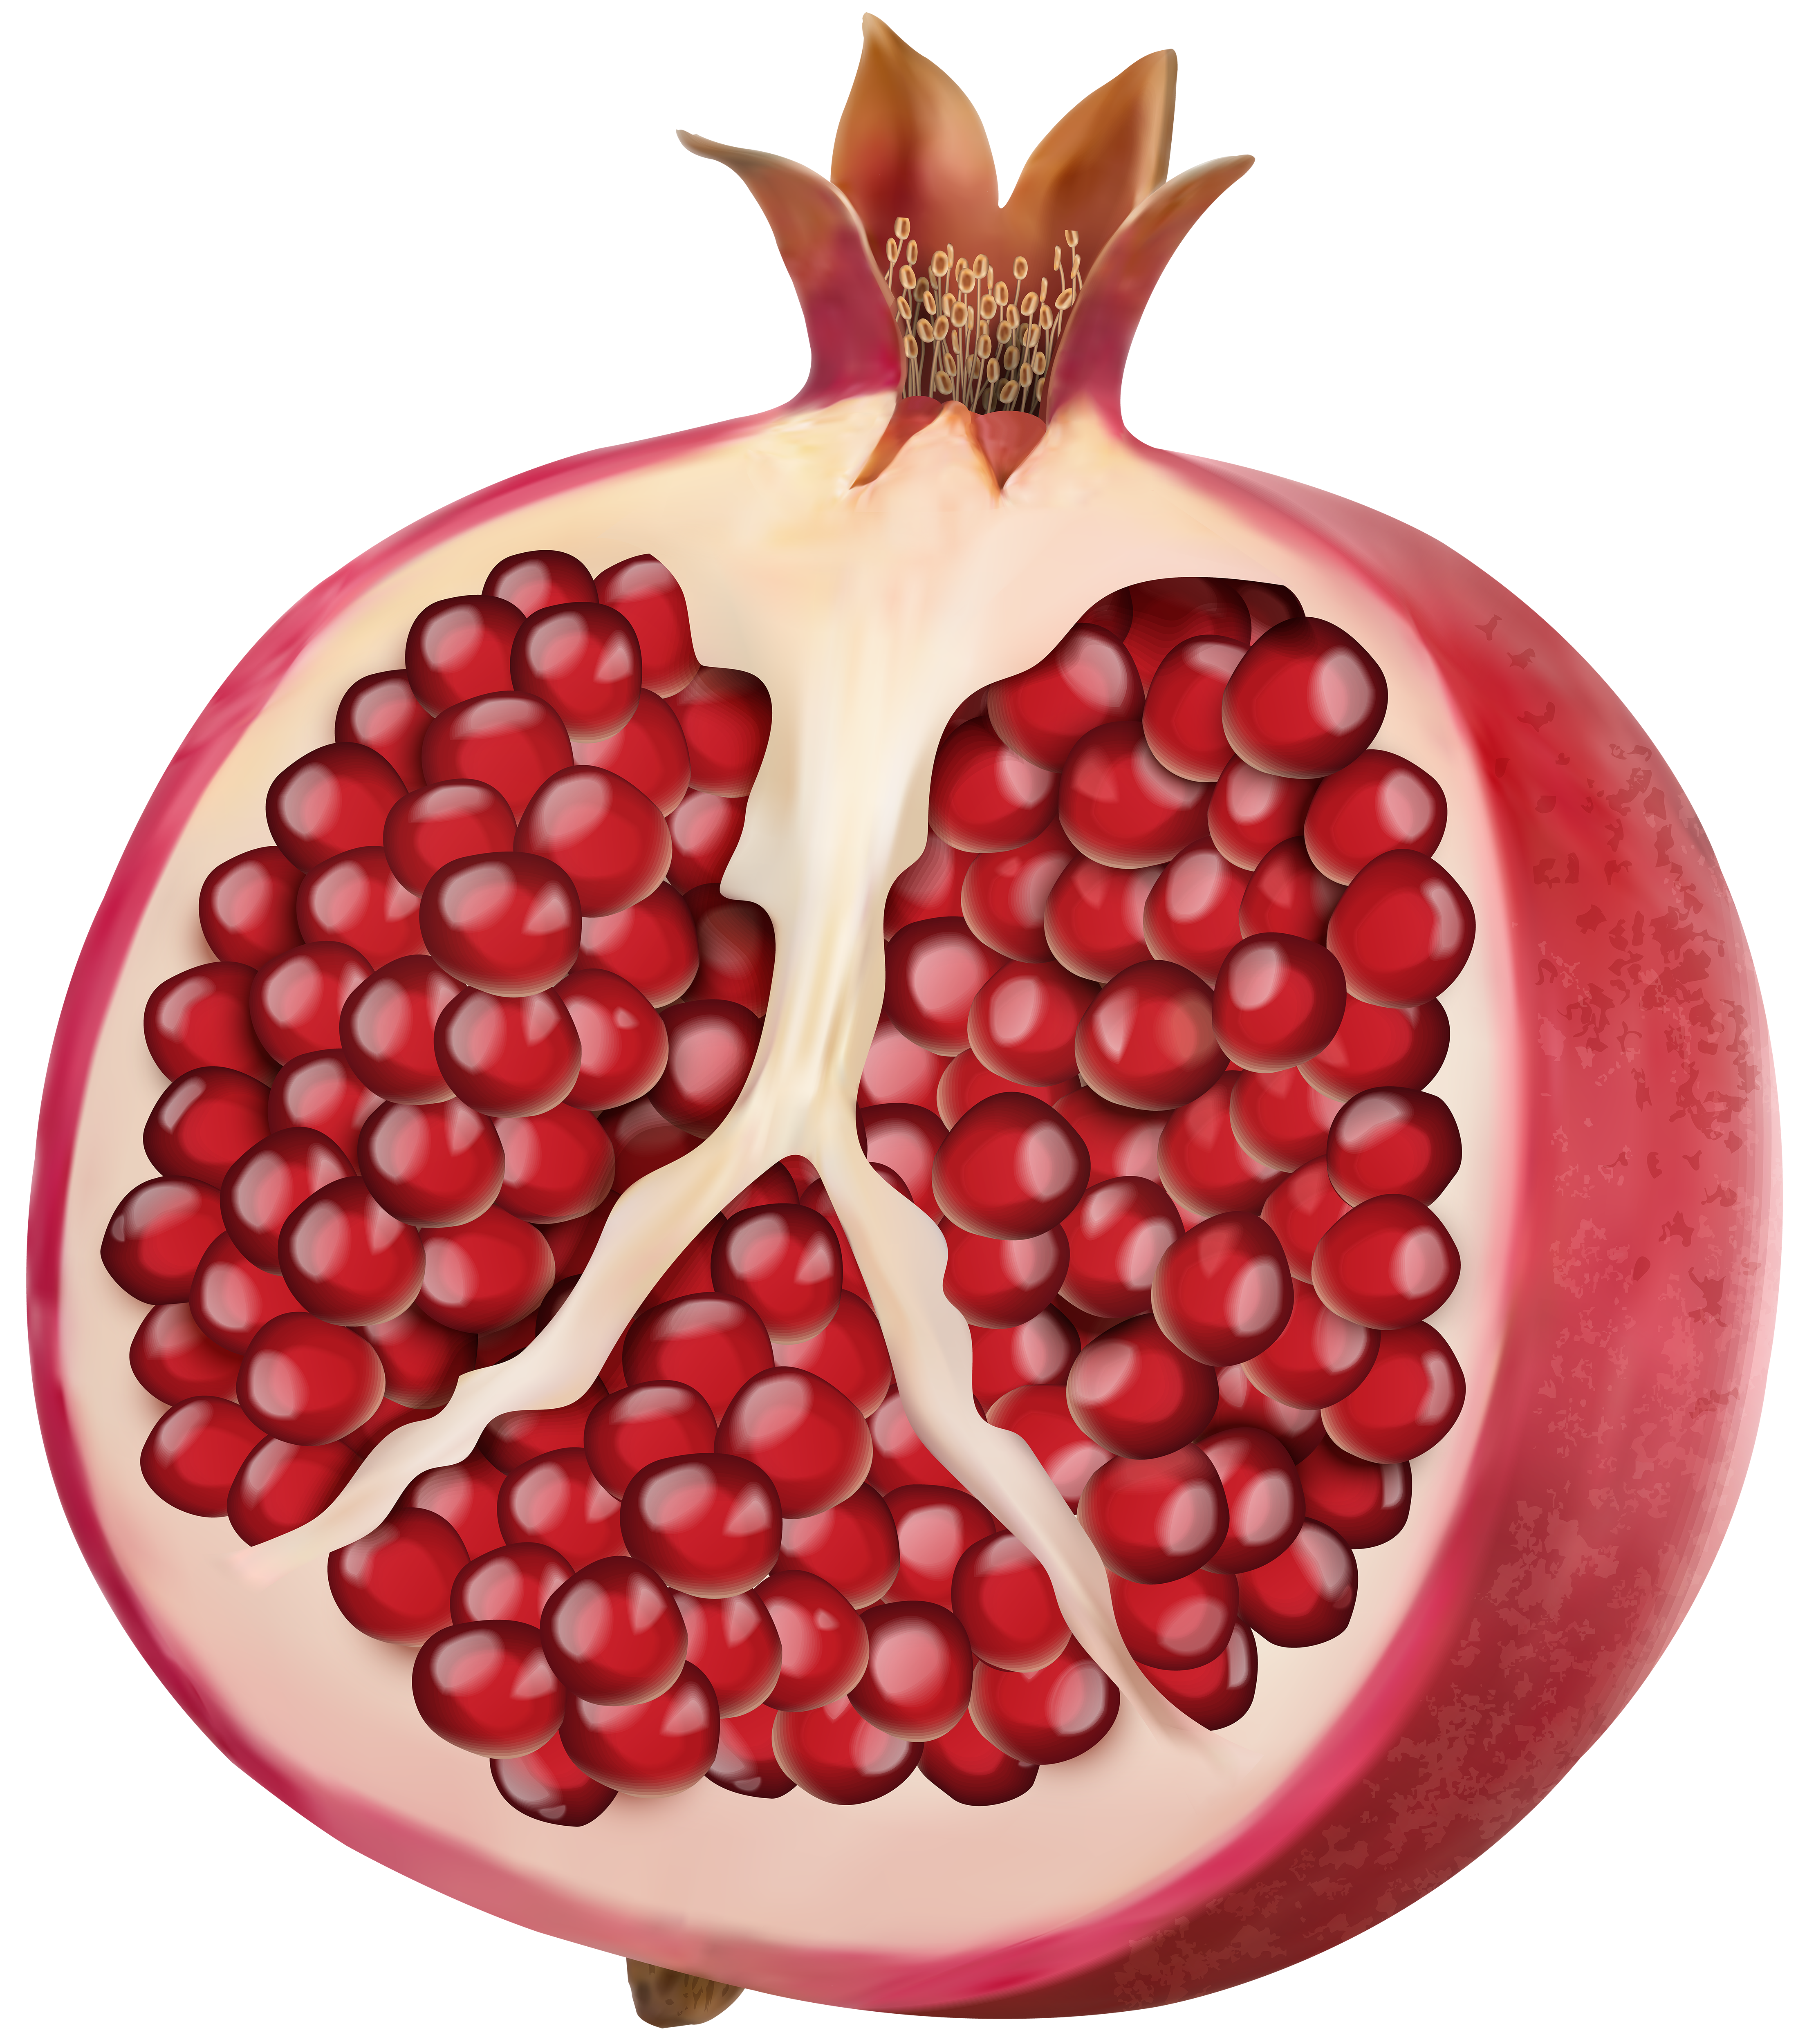 Png clip art image. Pomegranate clipart summer